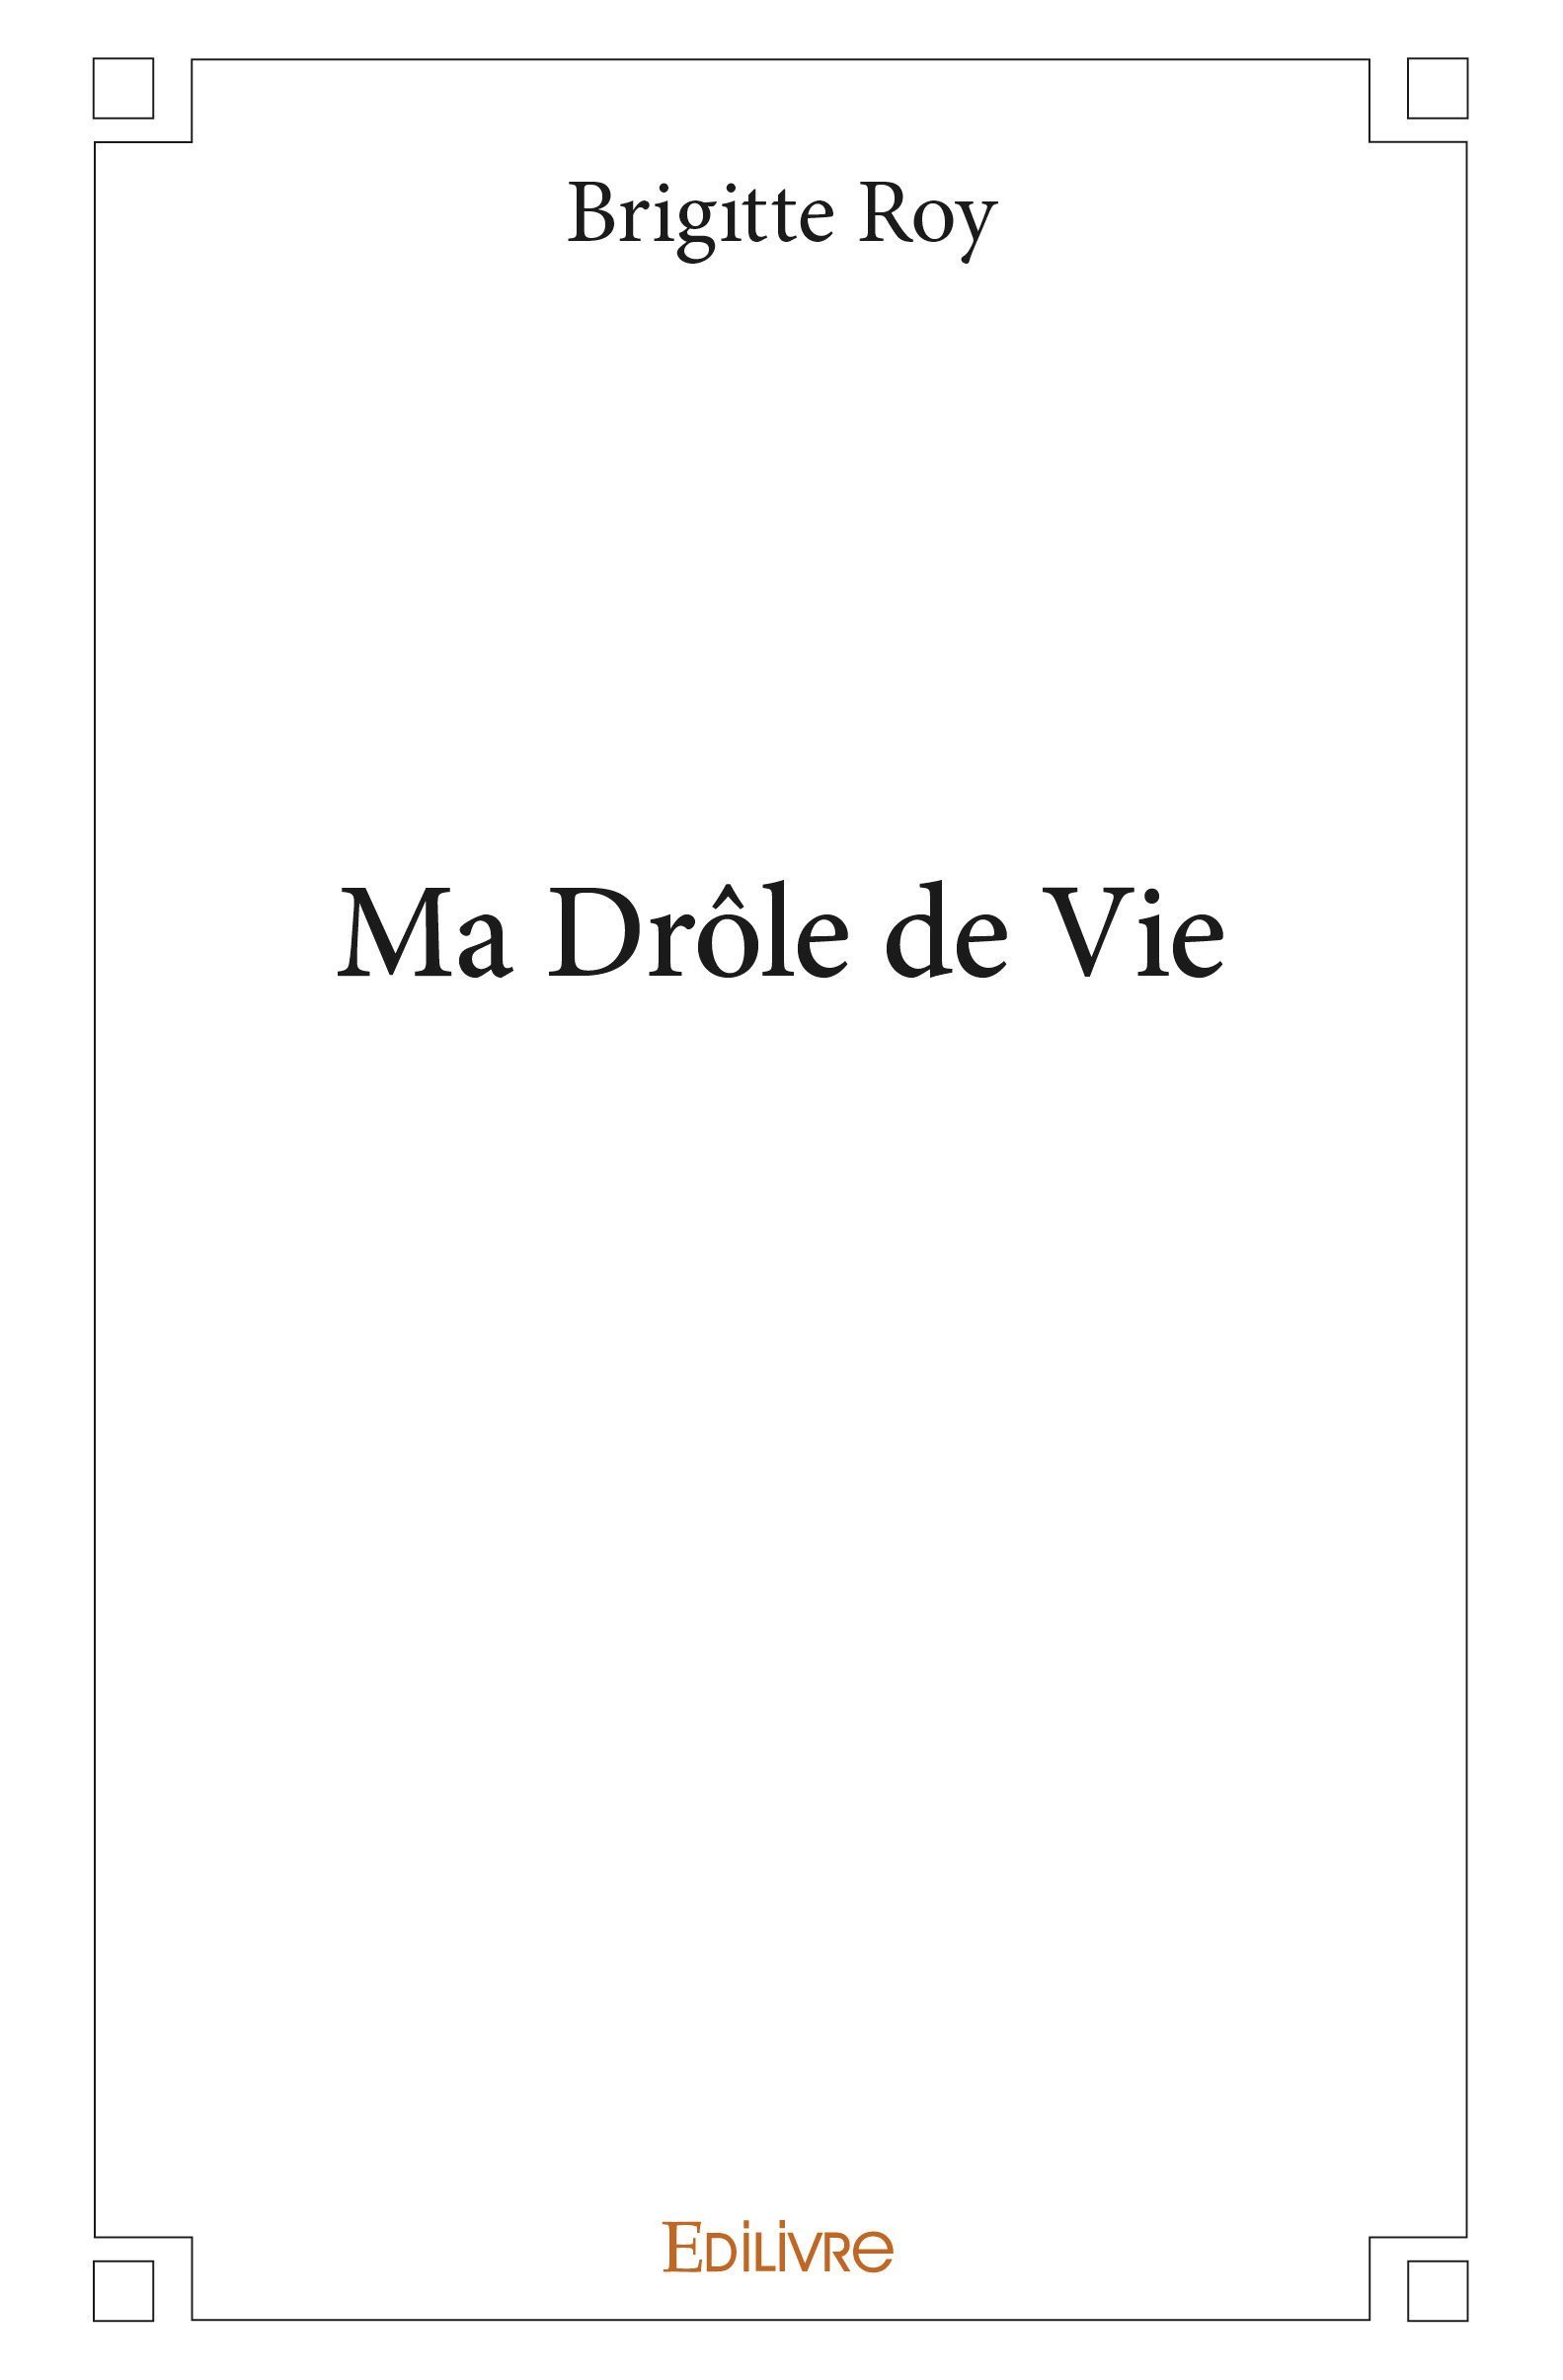 MA DROLE DE VIE